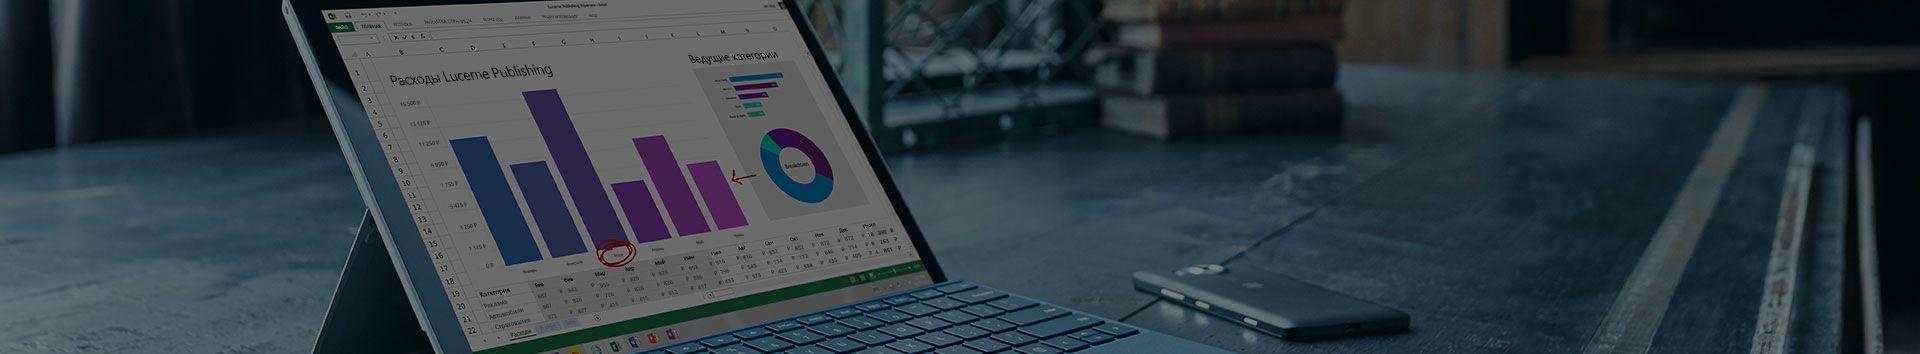 Отчет о расходах Microsoft Excel на экране планшета Microsoft Surface